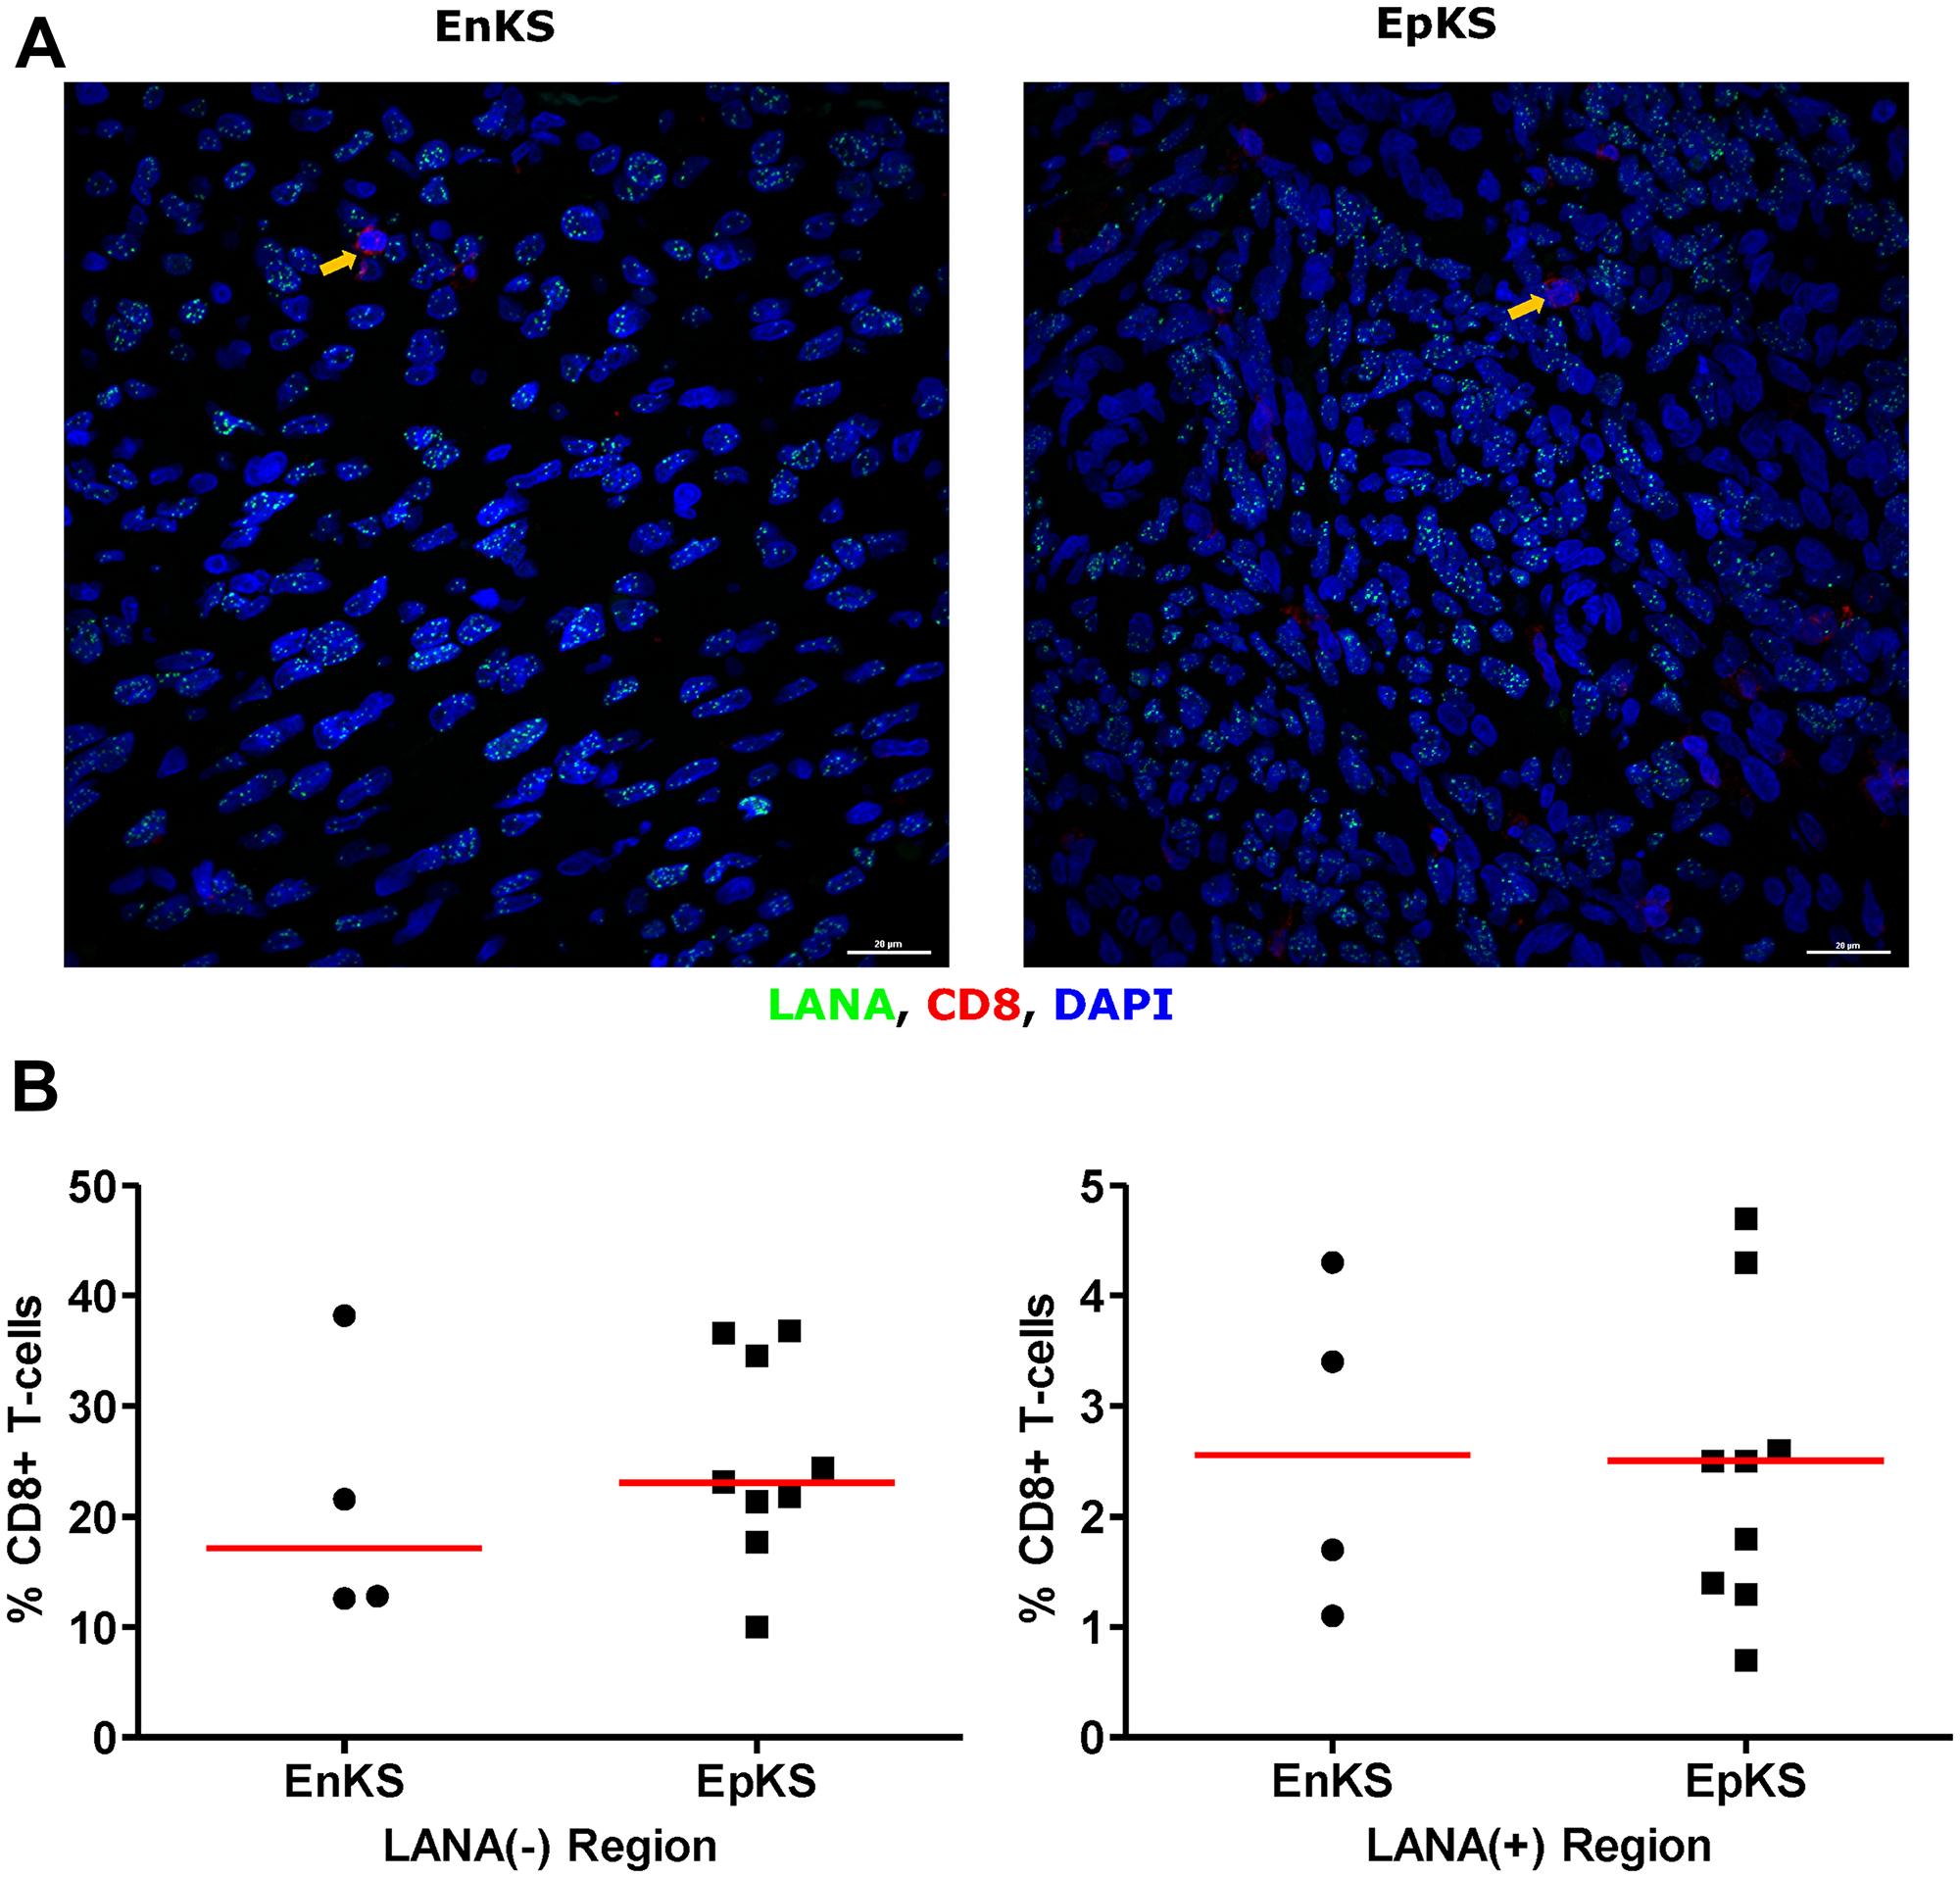 Dual-immunofluorescence staining of Kaposi's Sarcoma-associated Herpesvirus (KSHV) Latency Associated Nuclear Antigen (LANA) protein and CD8+ T-cells on Kaposi's Sarcoma (KS) tissues.